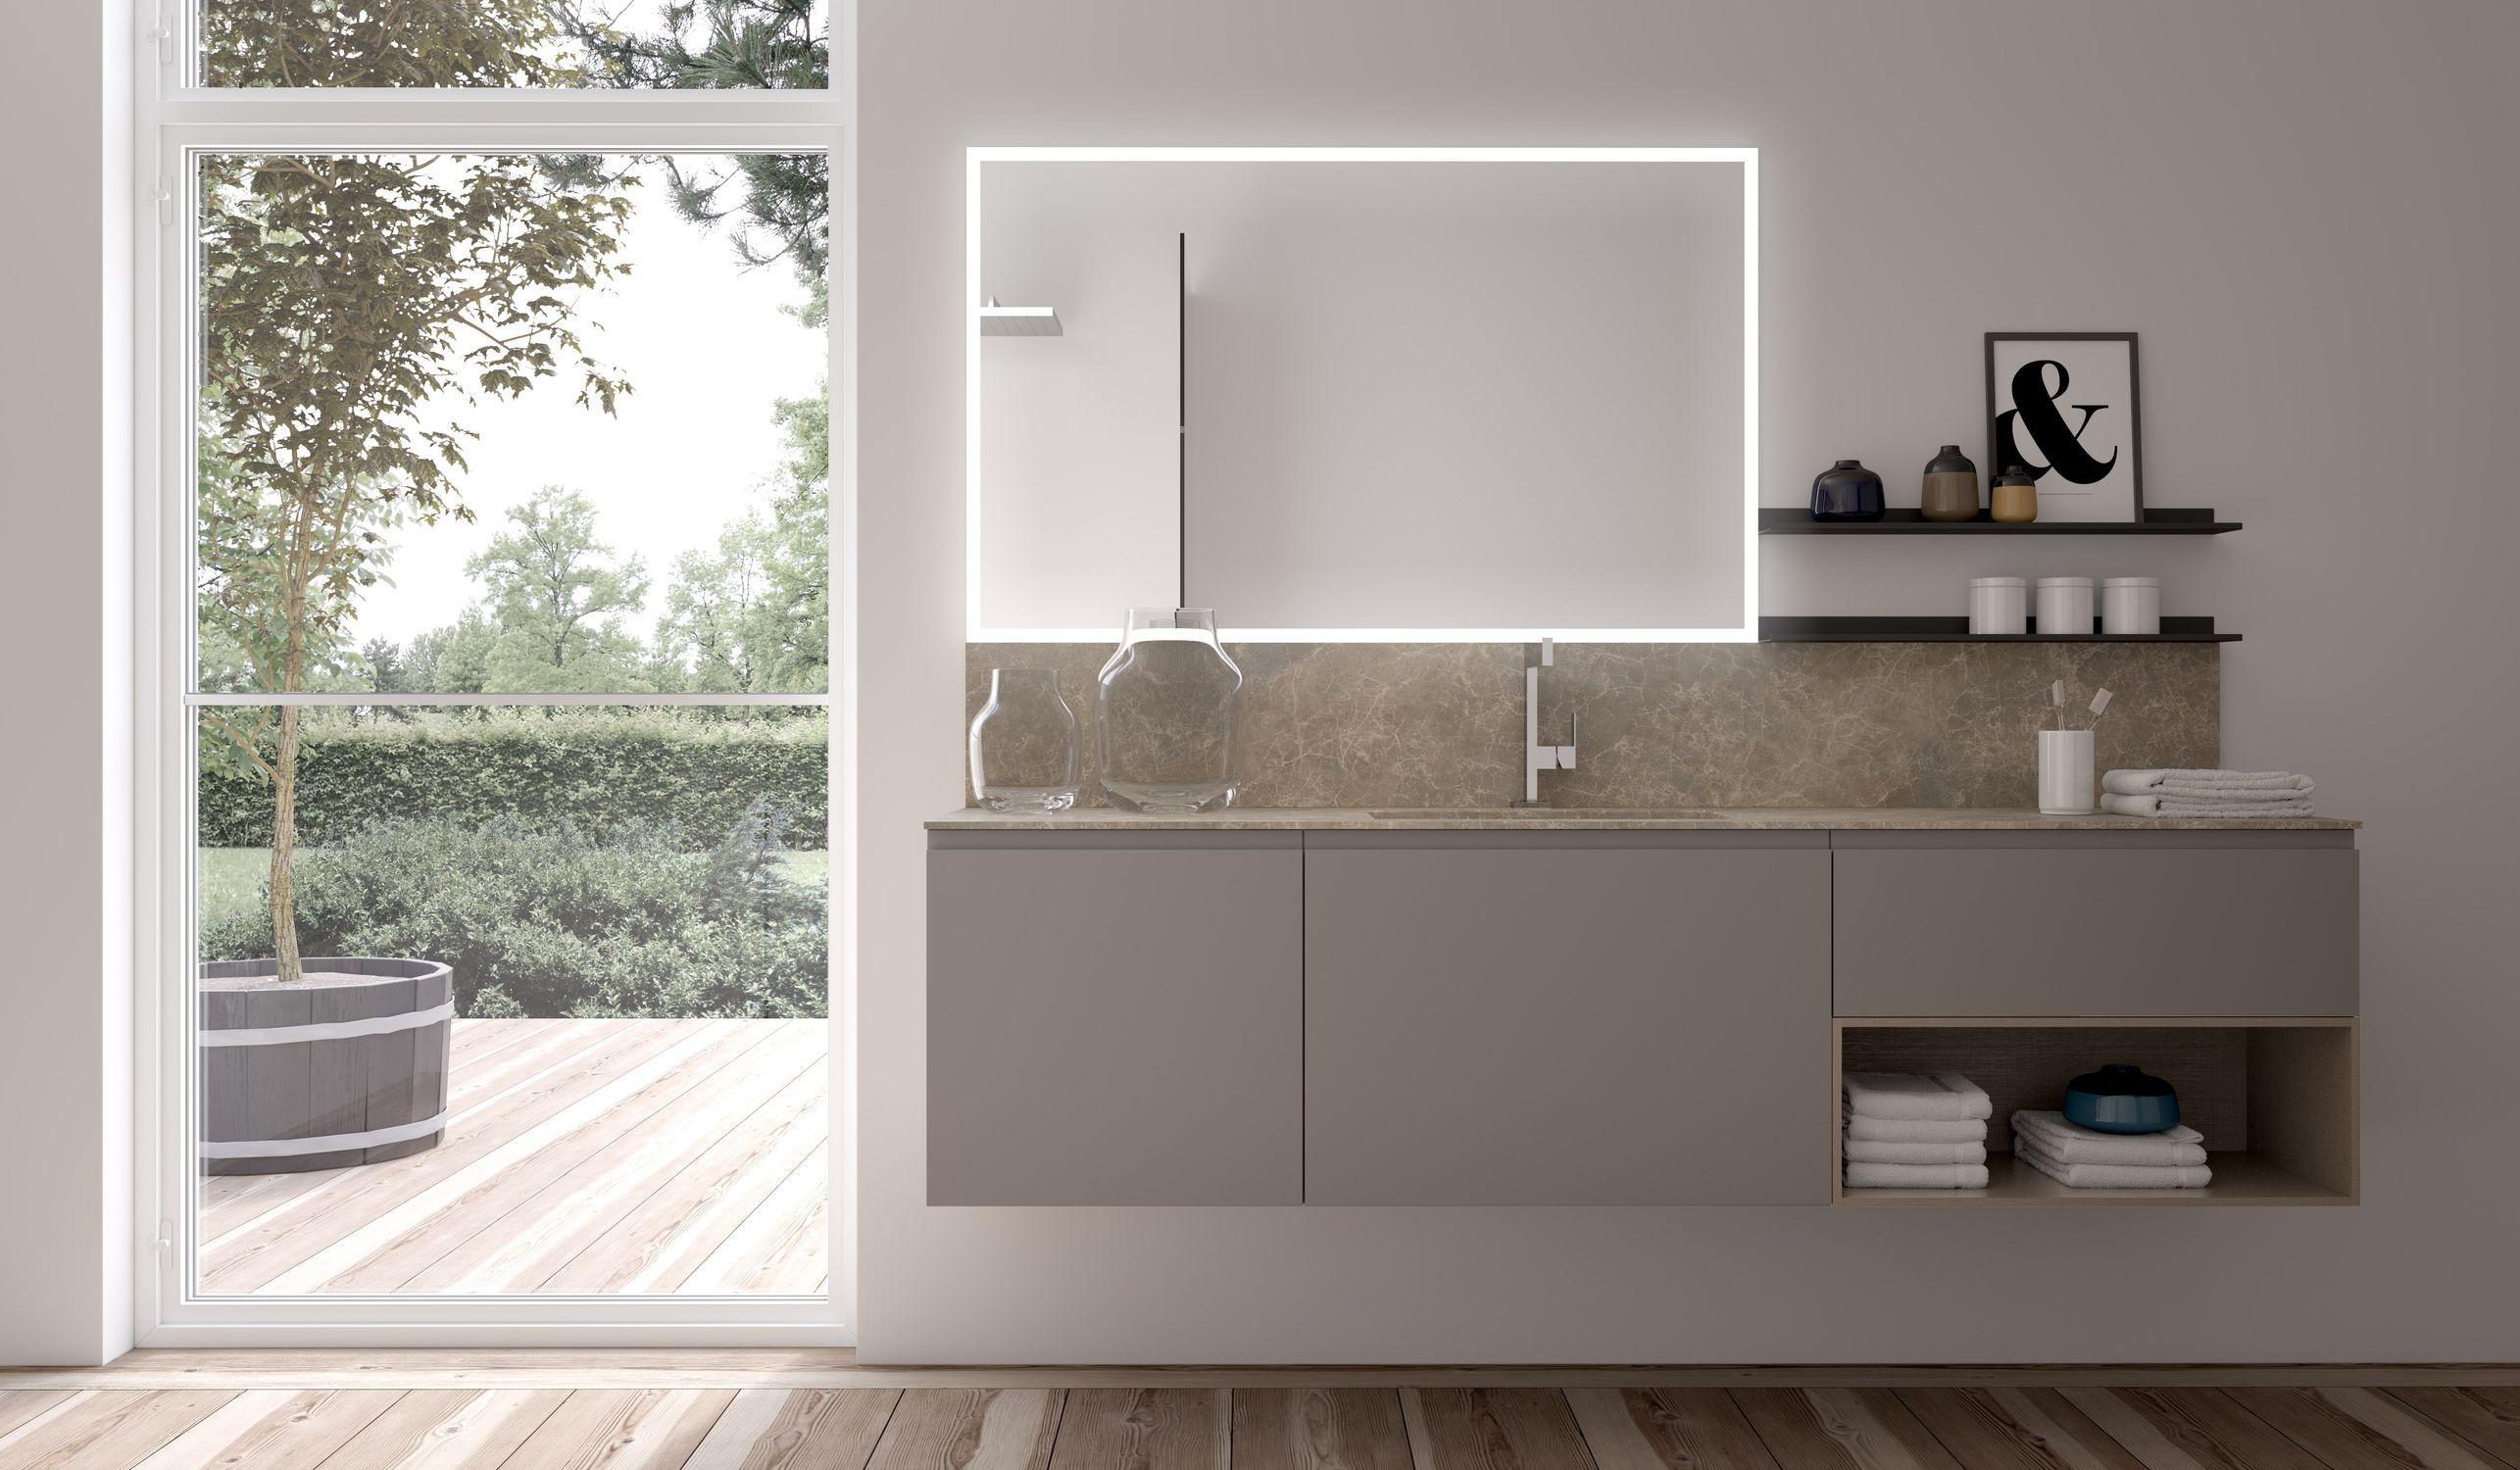 Hängend-Waschtischunterschrank / Holz / modern / Schubladen - GOLA ... | {Waschtischunterschrank modern 35}